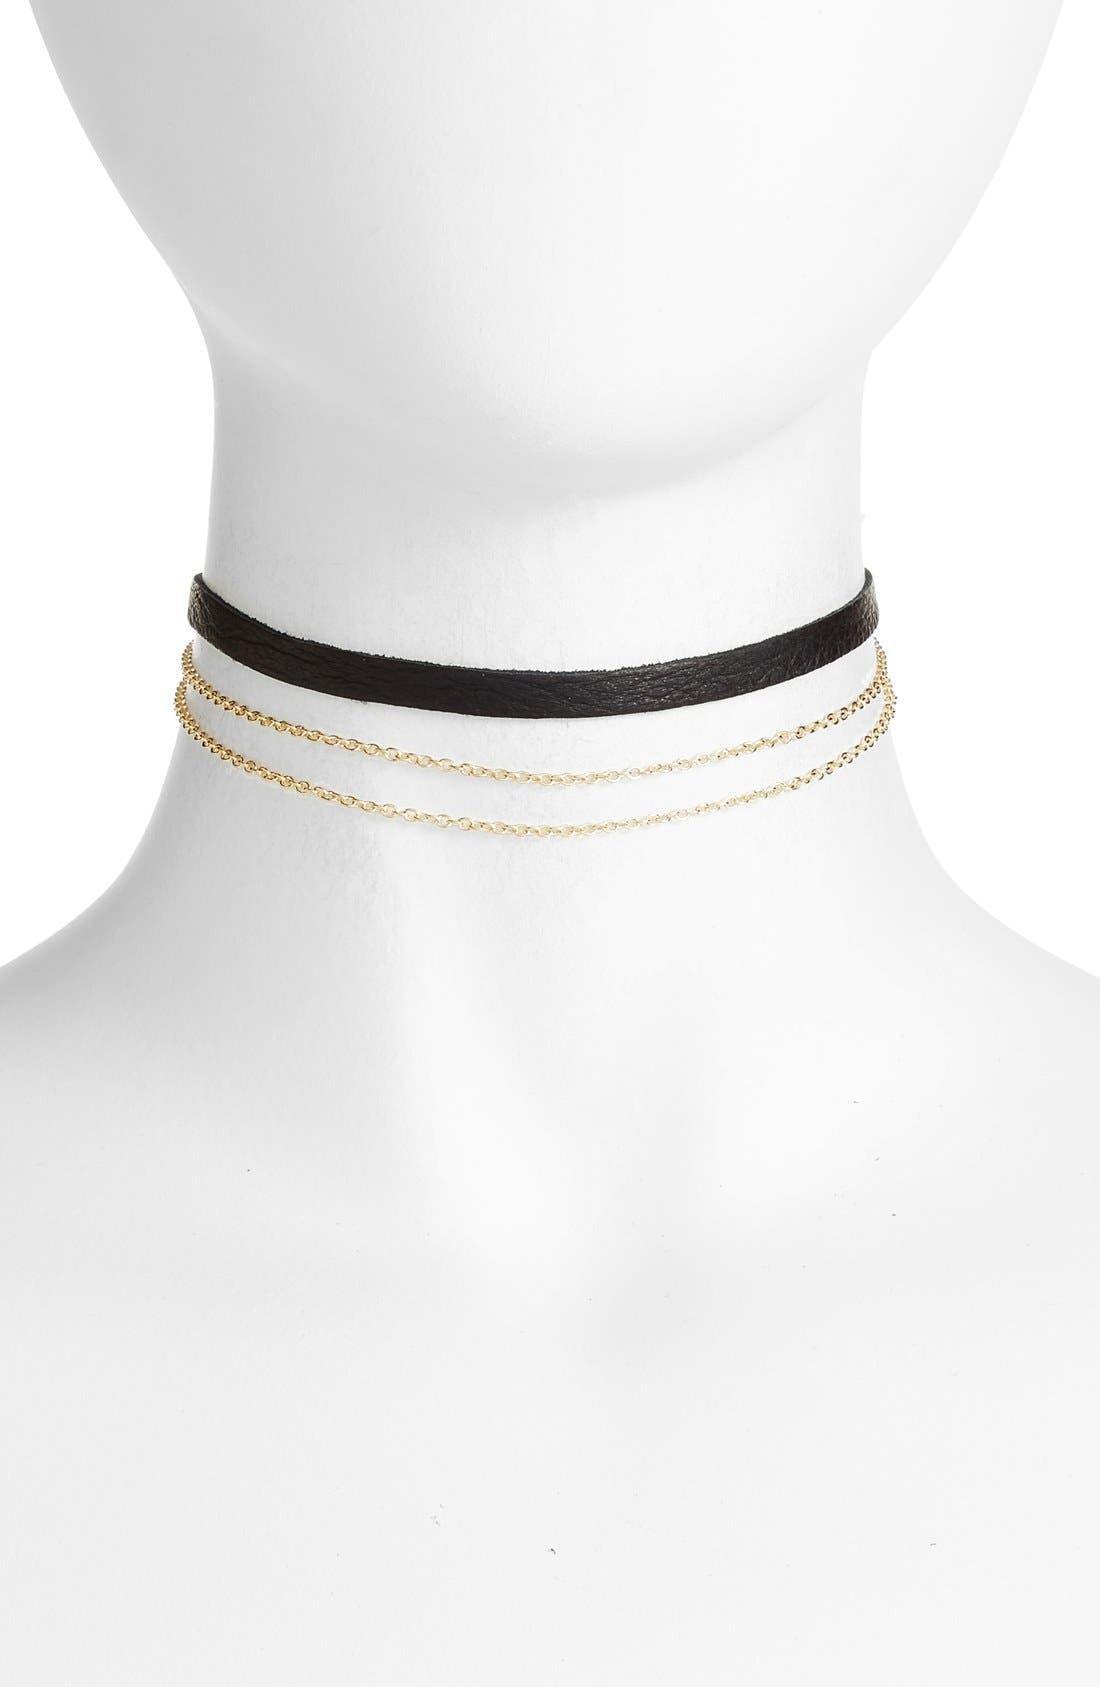 Alternate Image 1 Selected - Nashelle Leather & Chain Choker